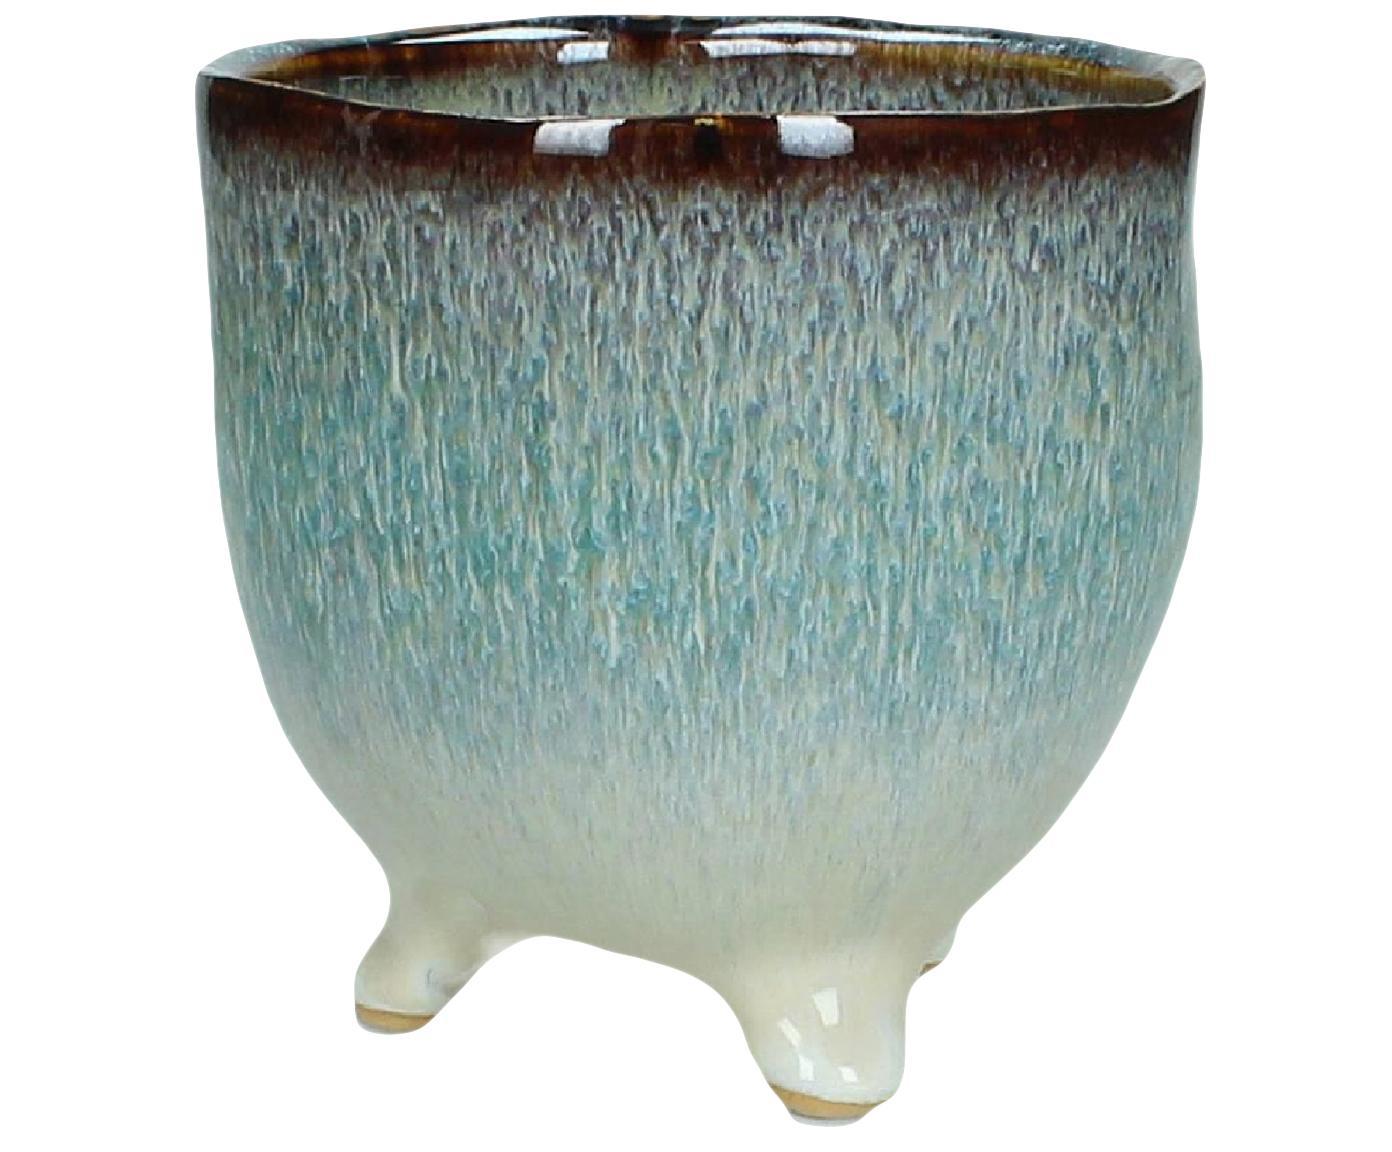 Macetero Blue Lagoon, Gres, Turquesa, beige, marrón, Ø 12 x Al 12 cm